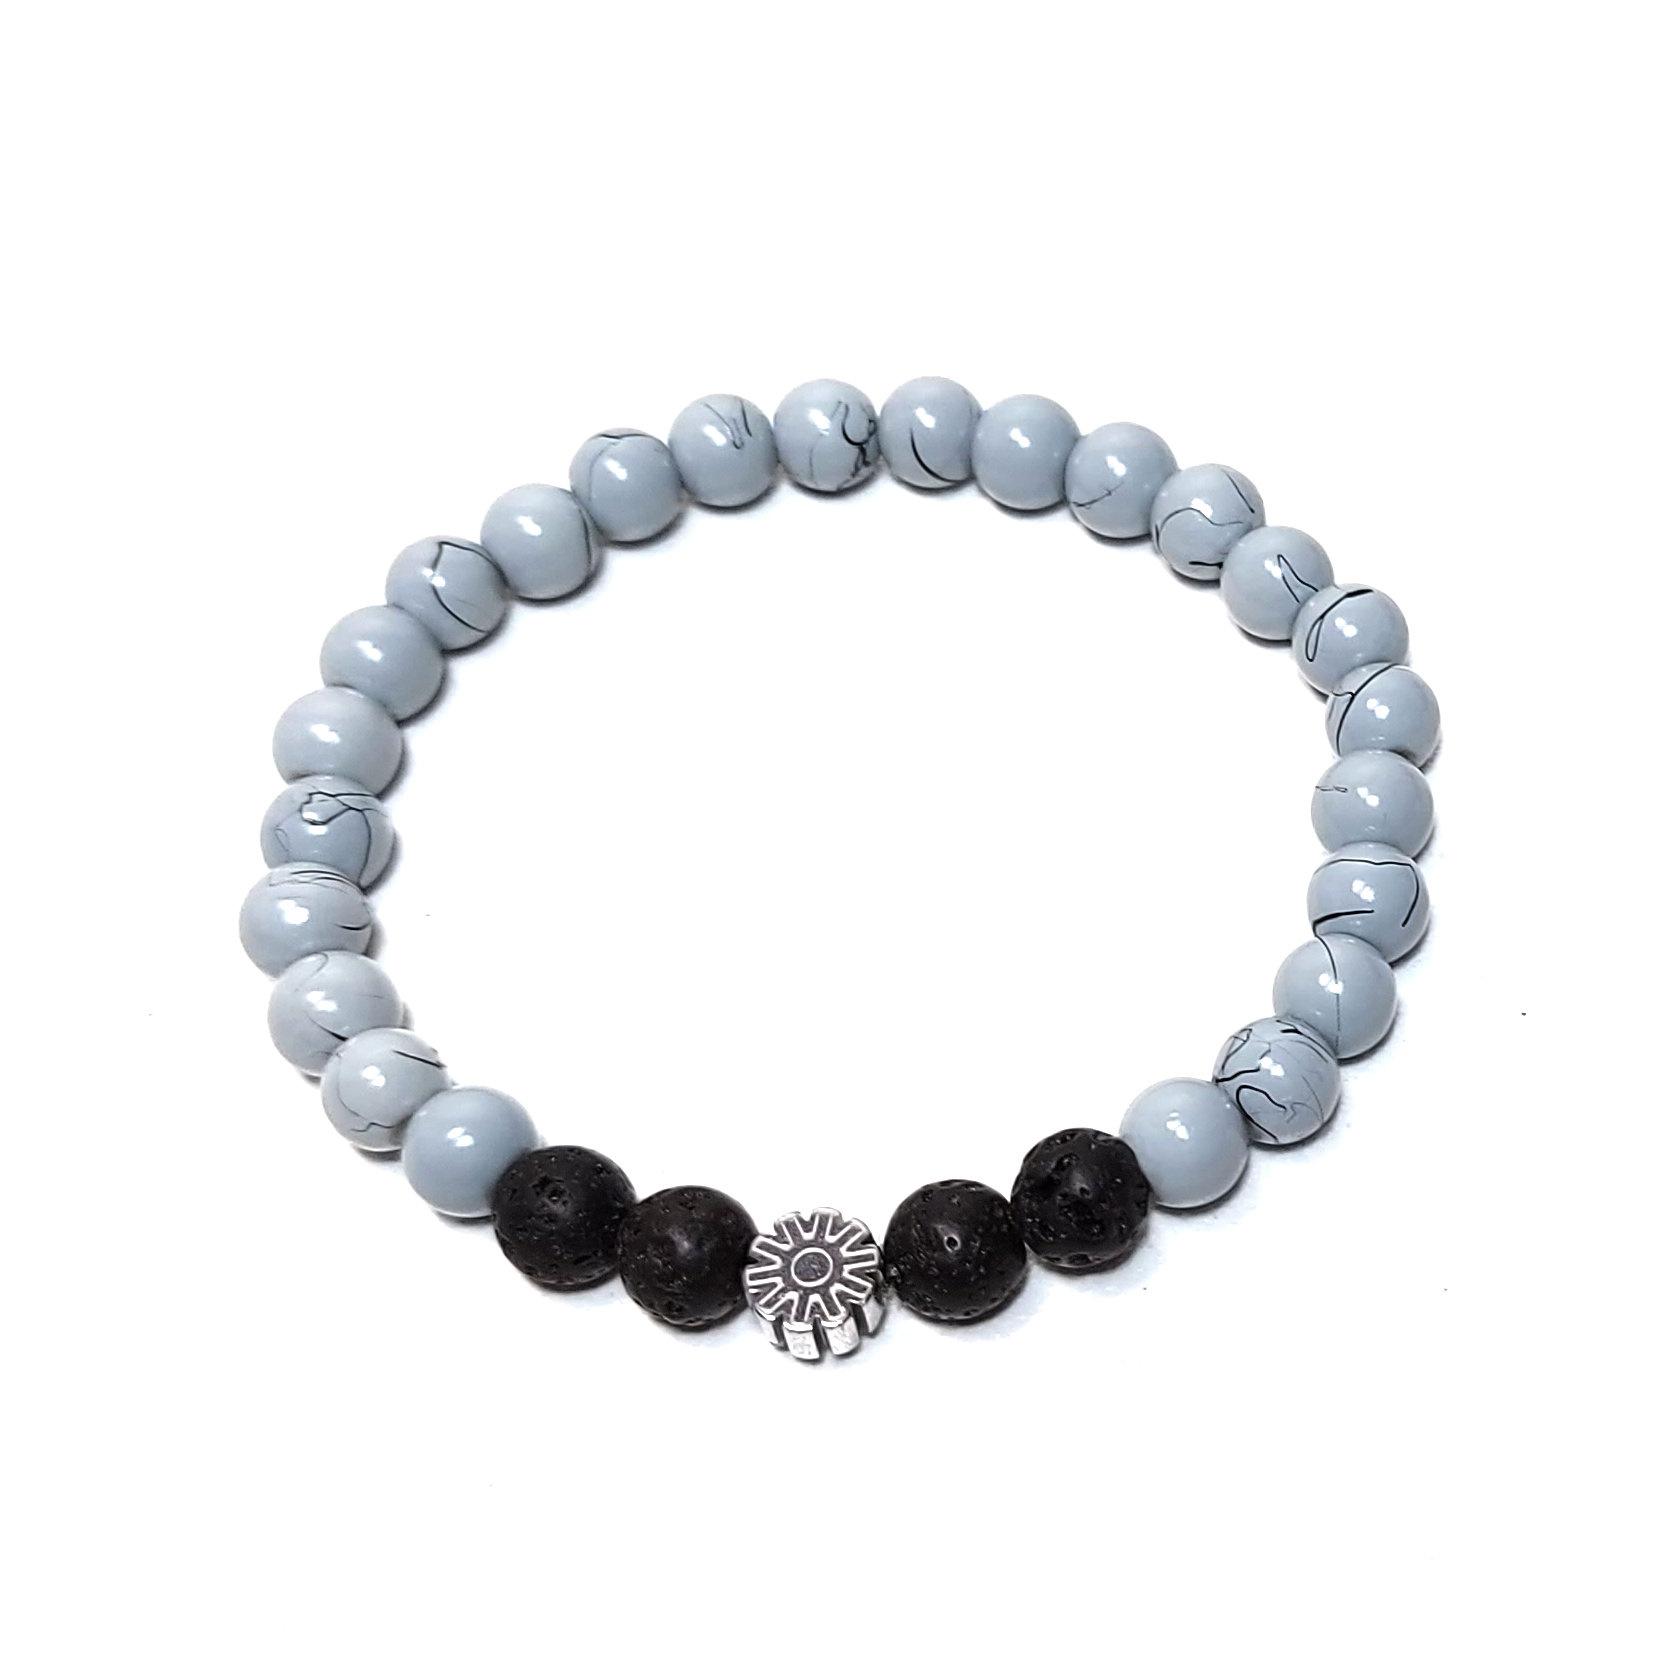 Sazou Jewels Armband Boys  - Natural Stones met lava en hematiet mandala spacer